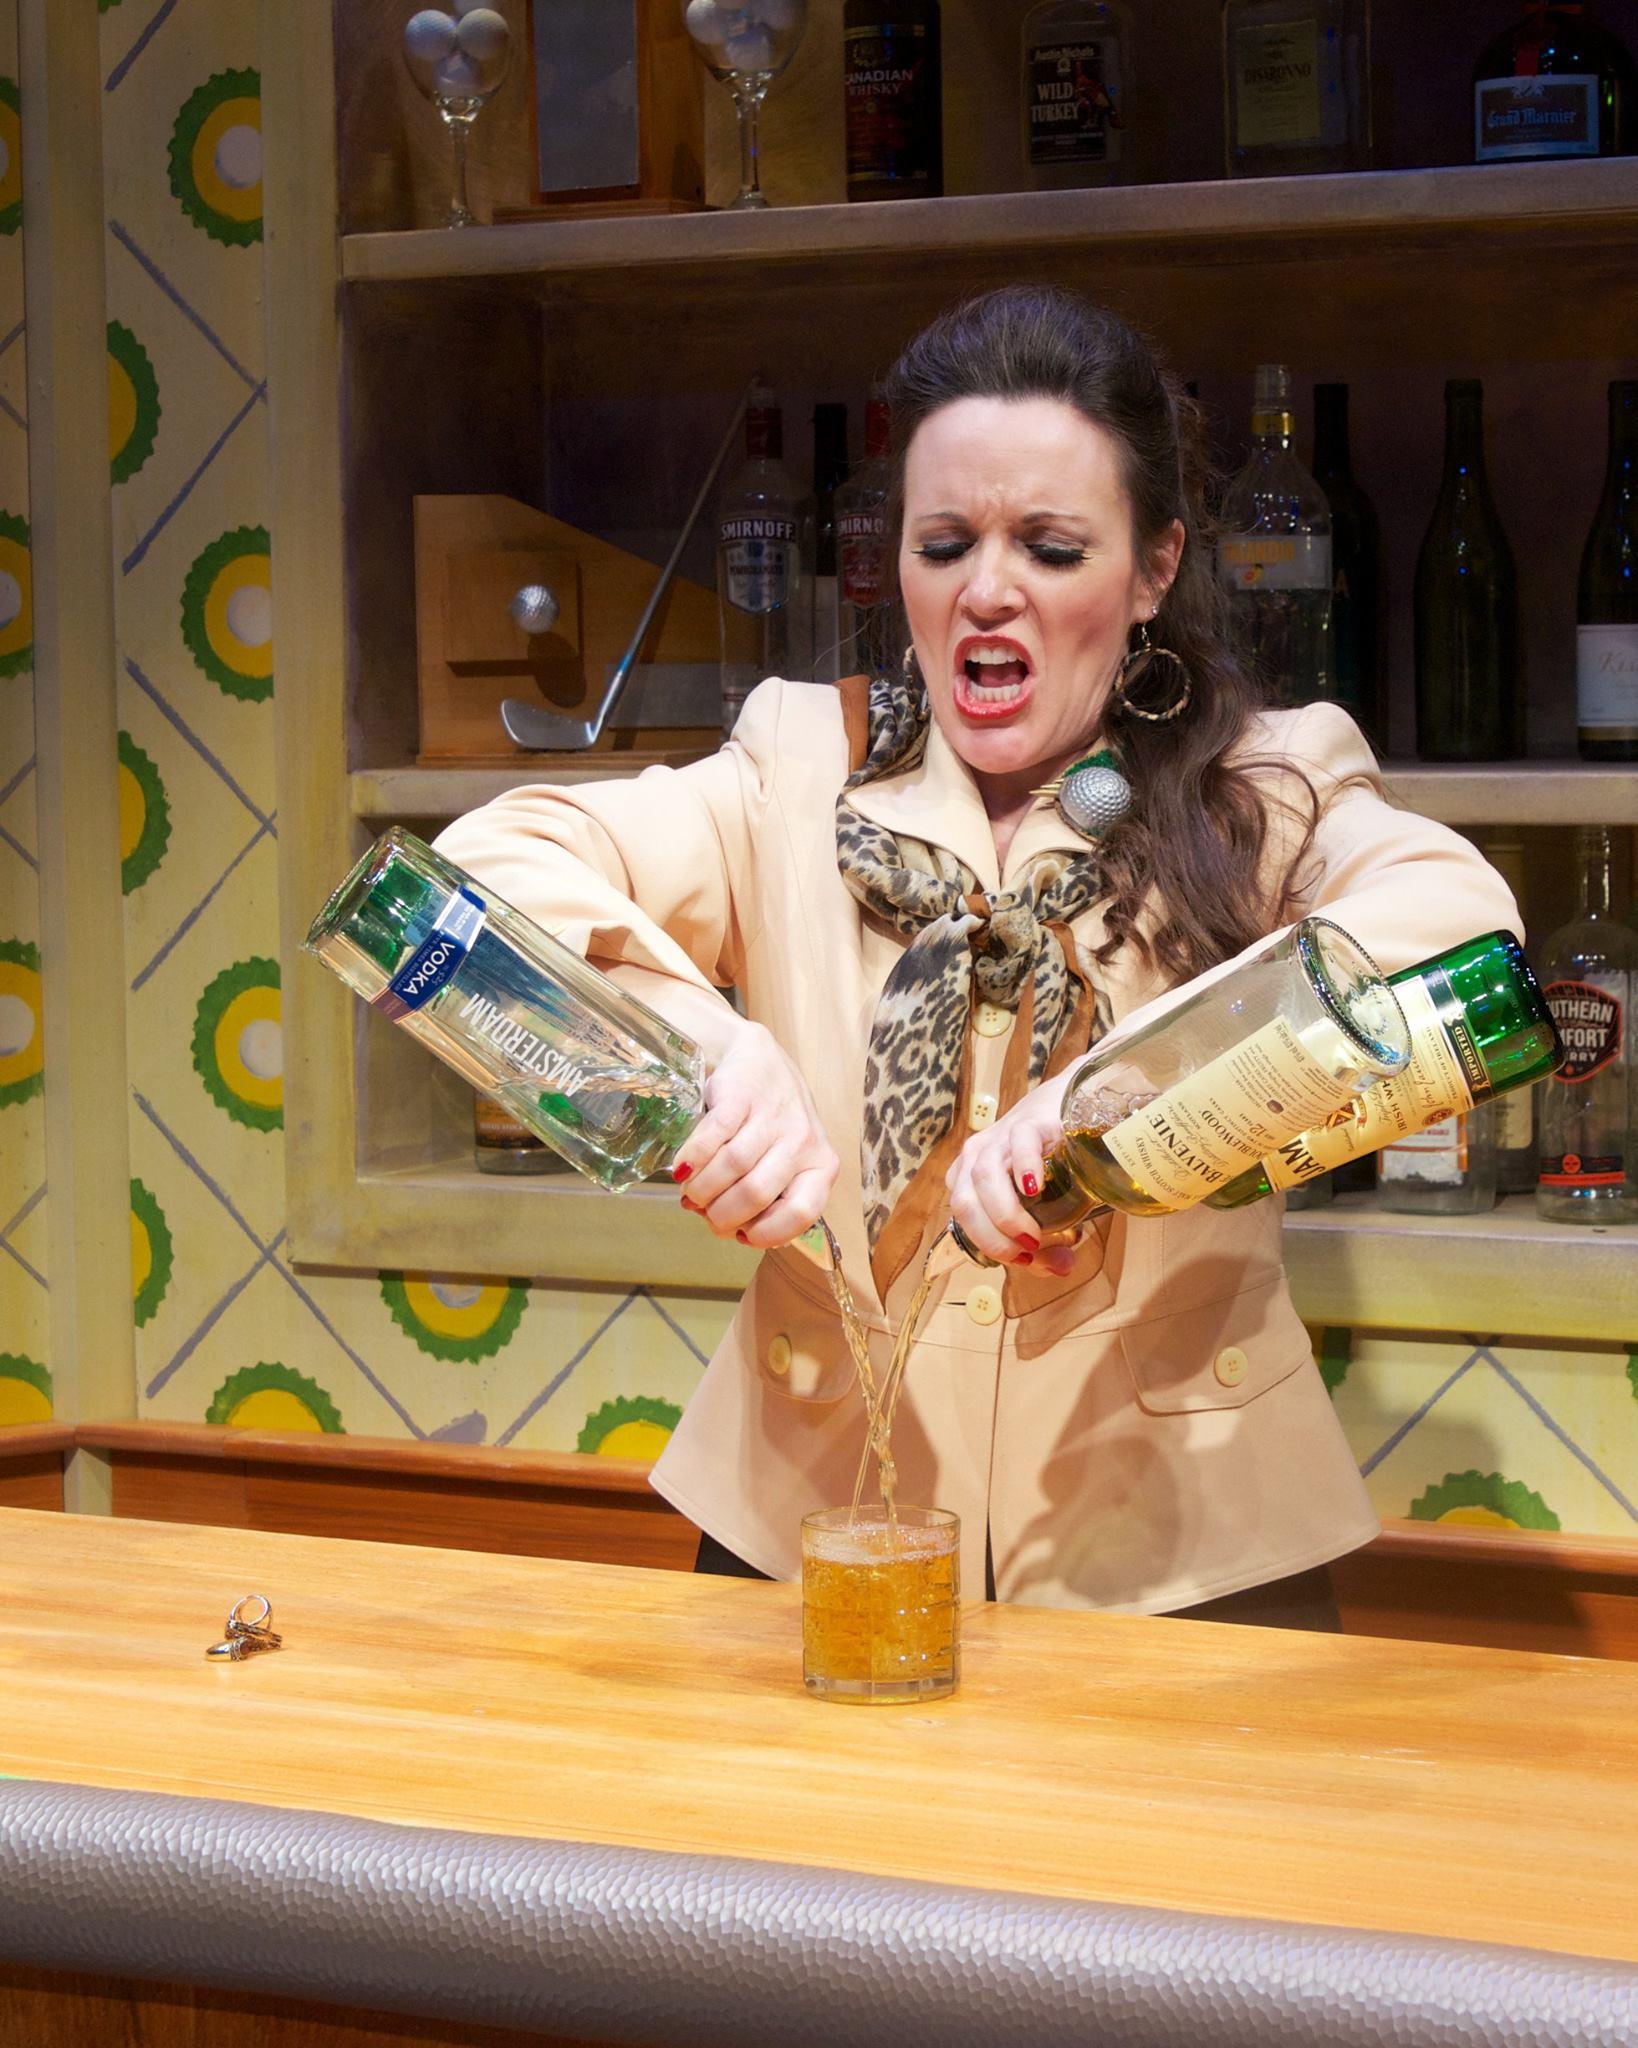 Maren MacLean in the 2014 Summer Repertory Season at Actors Theatre. (Photo by John Groseclose)